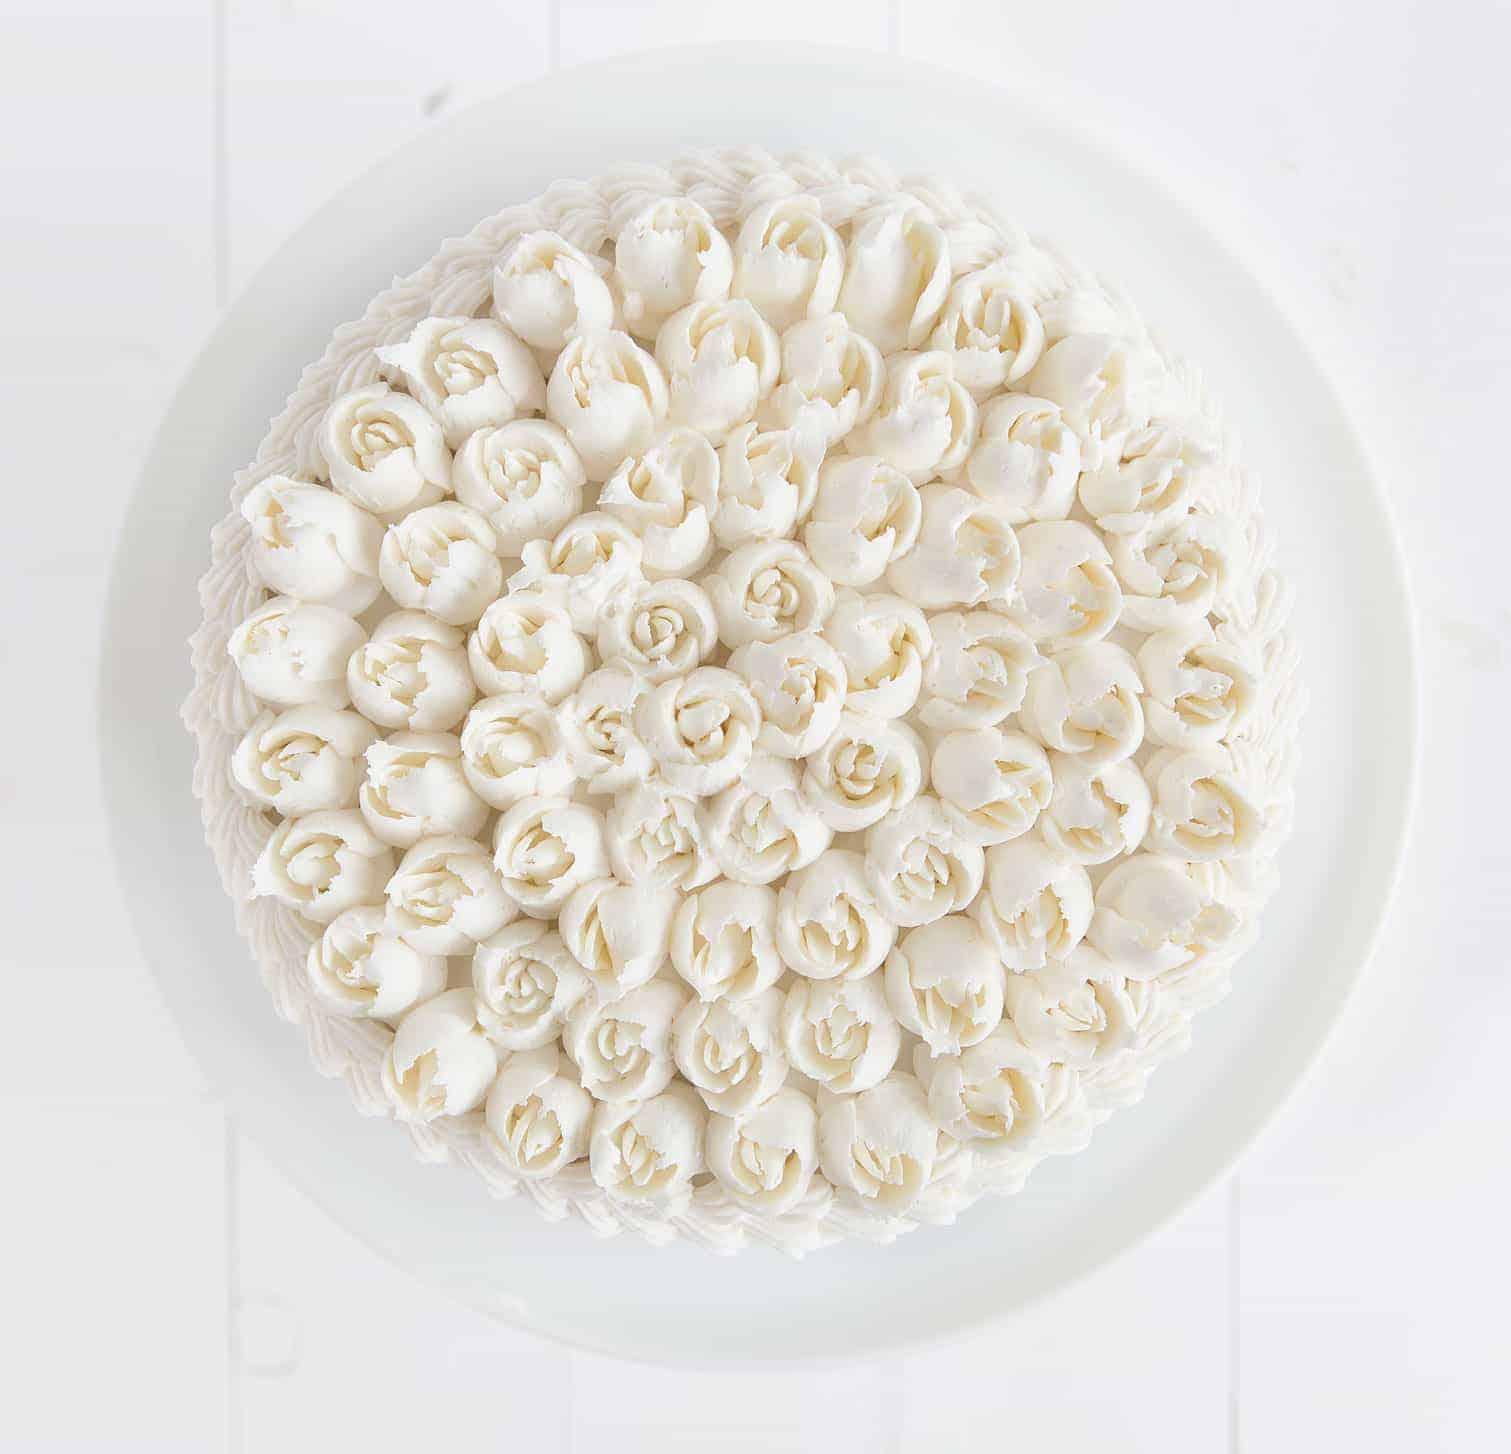 Sour Cream Cake Filling Uk